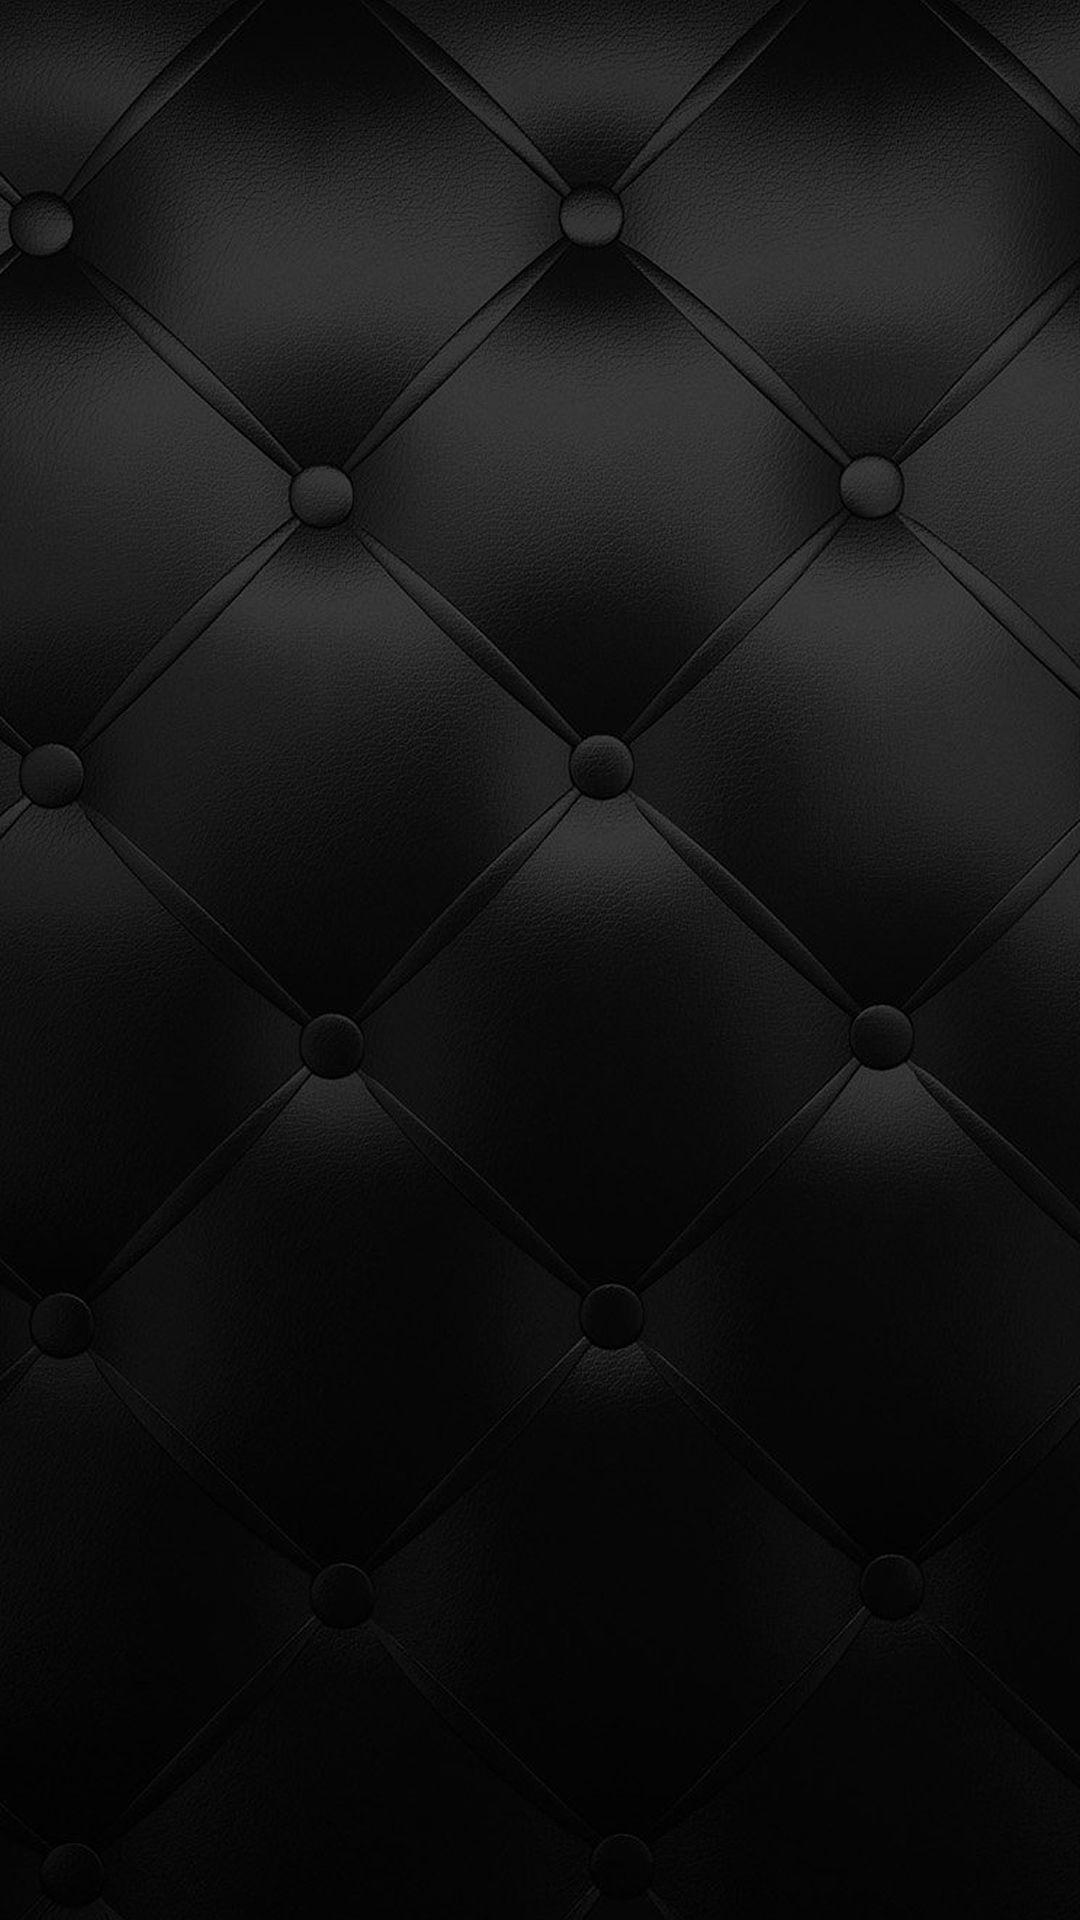 Black Wallpaper Iphone 6 Hd Classy Wallpaper Black Textured Wallpaper Dark Wallpaper